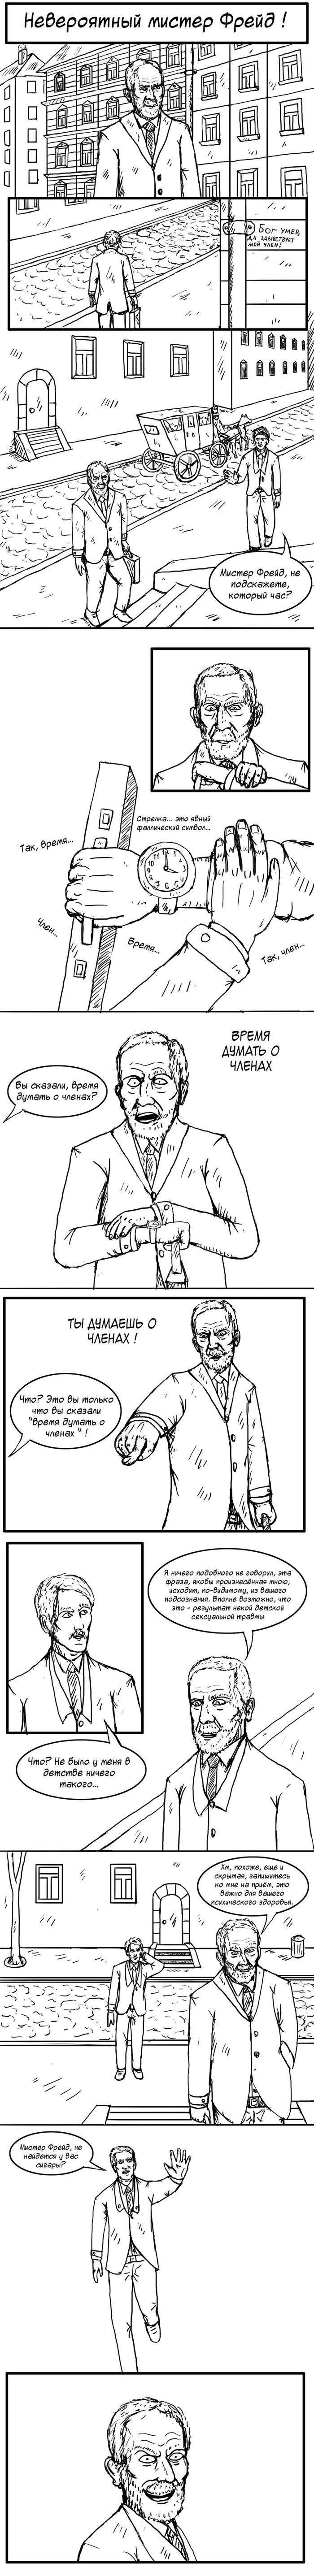 Мистер Фрейд Фрейд, Комиксы, Член, Длиннопост